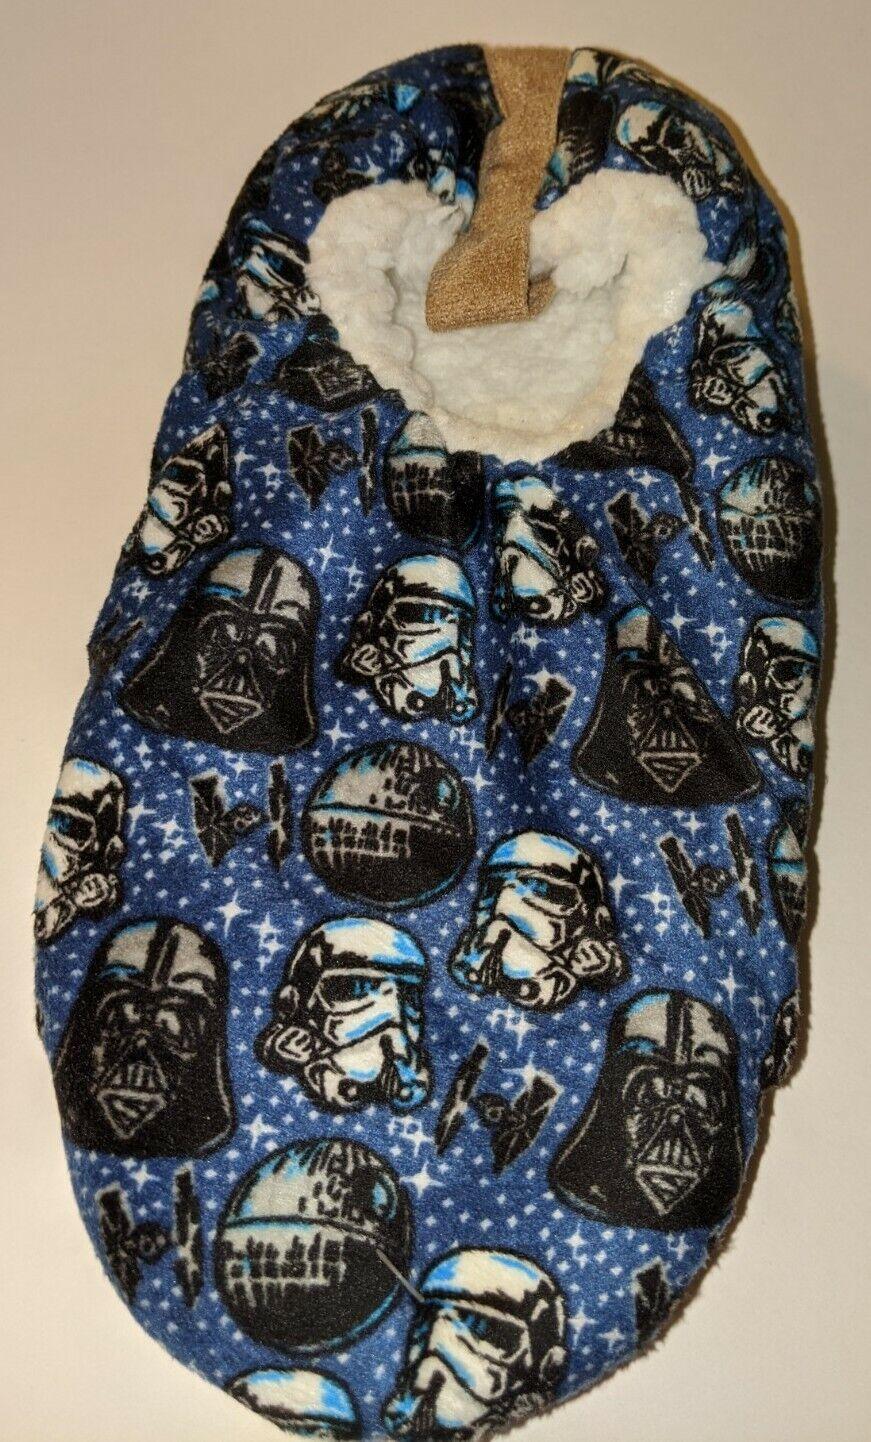 Darth Vader Slipper Socks Warm Cozy Soft Disney Star Wars House Shoes Men's 6.5